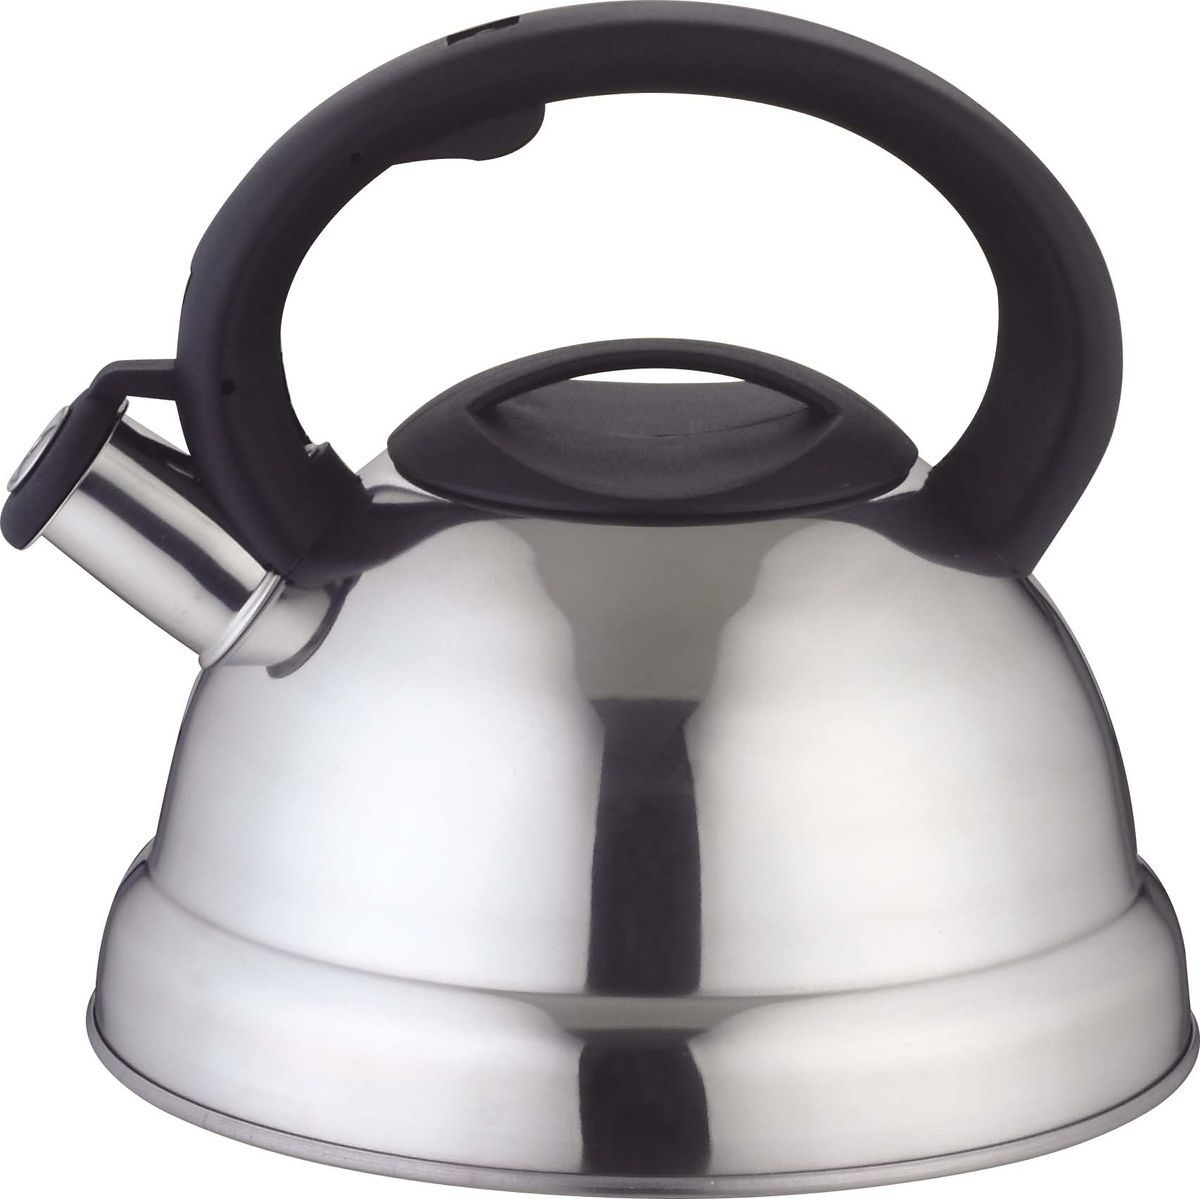 Чайник Bekker De Luxe, металлический, 2,8 л. BK-S614